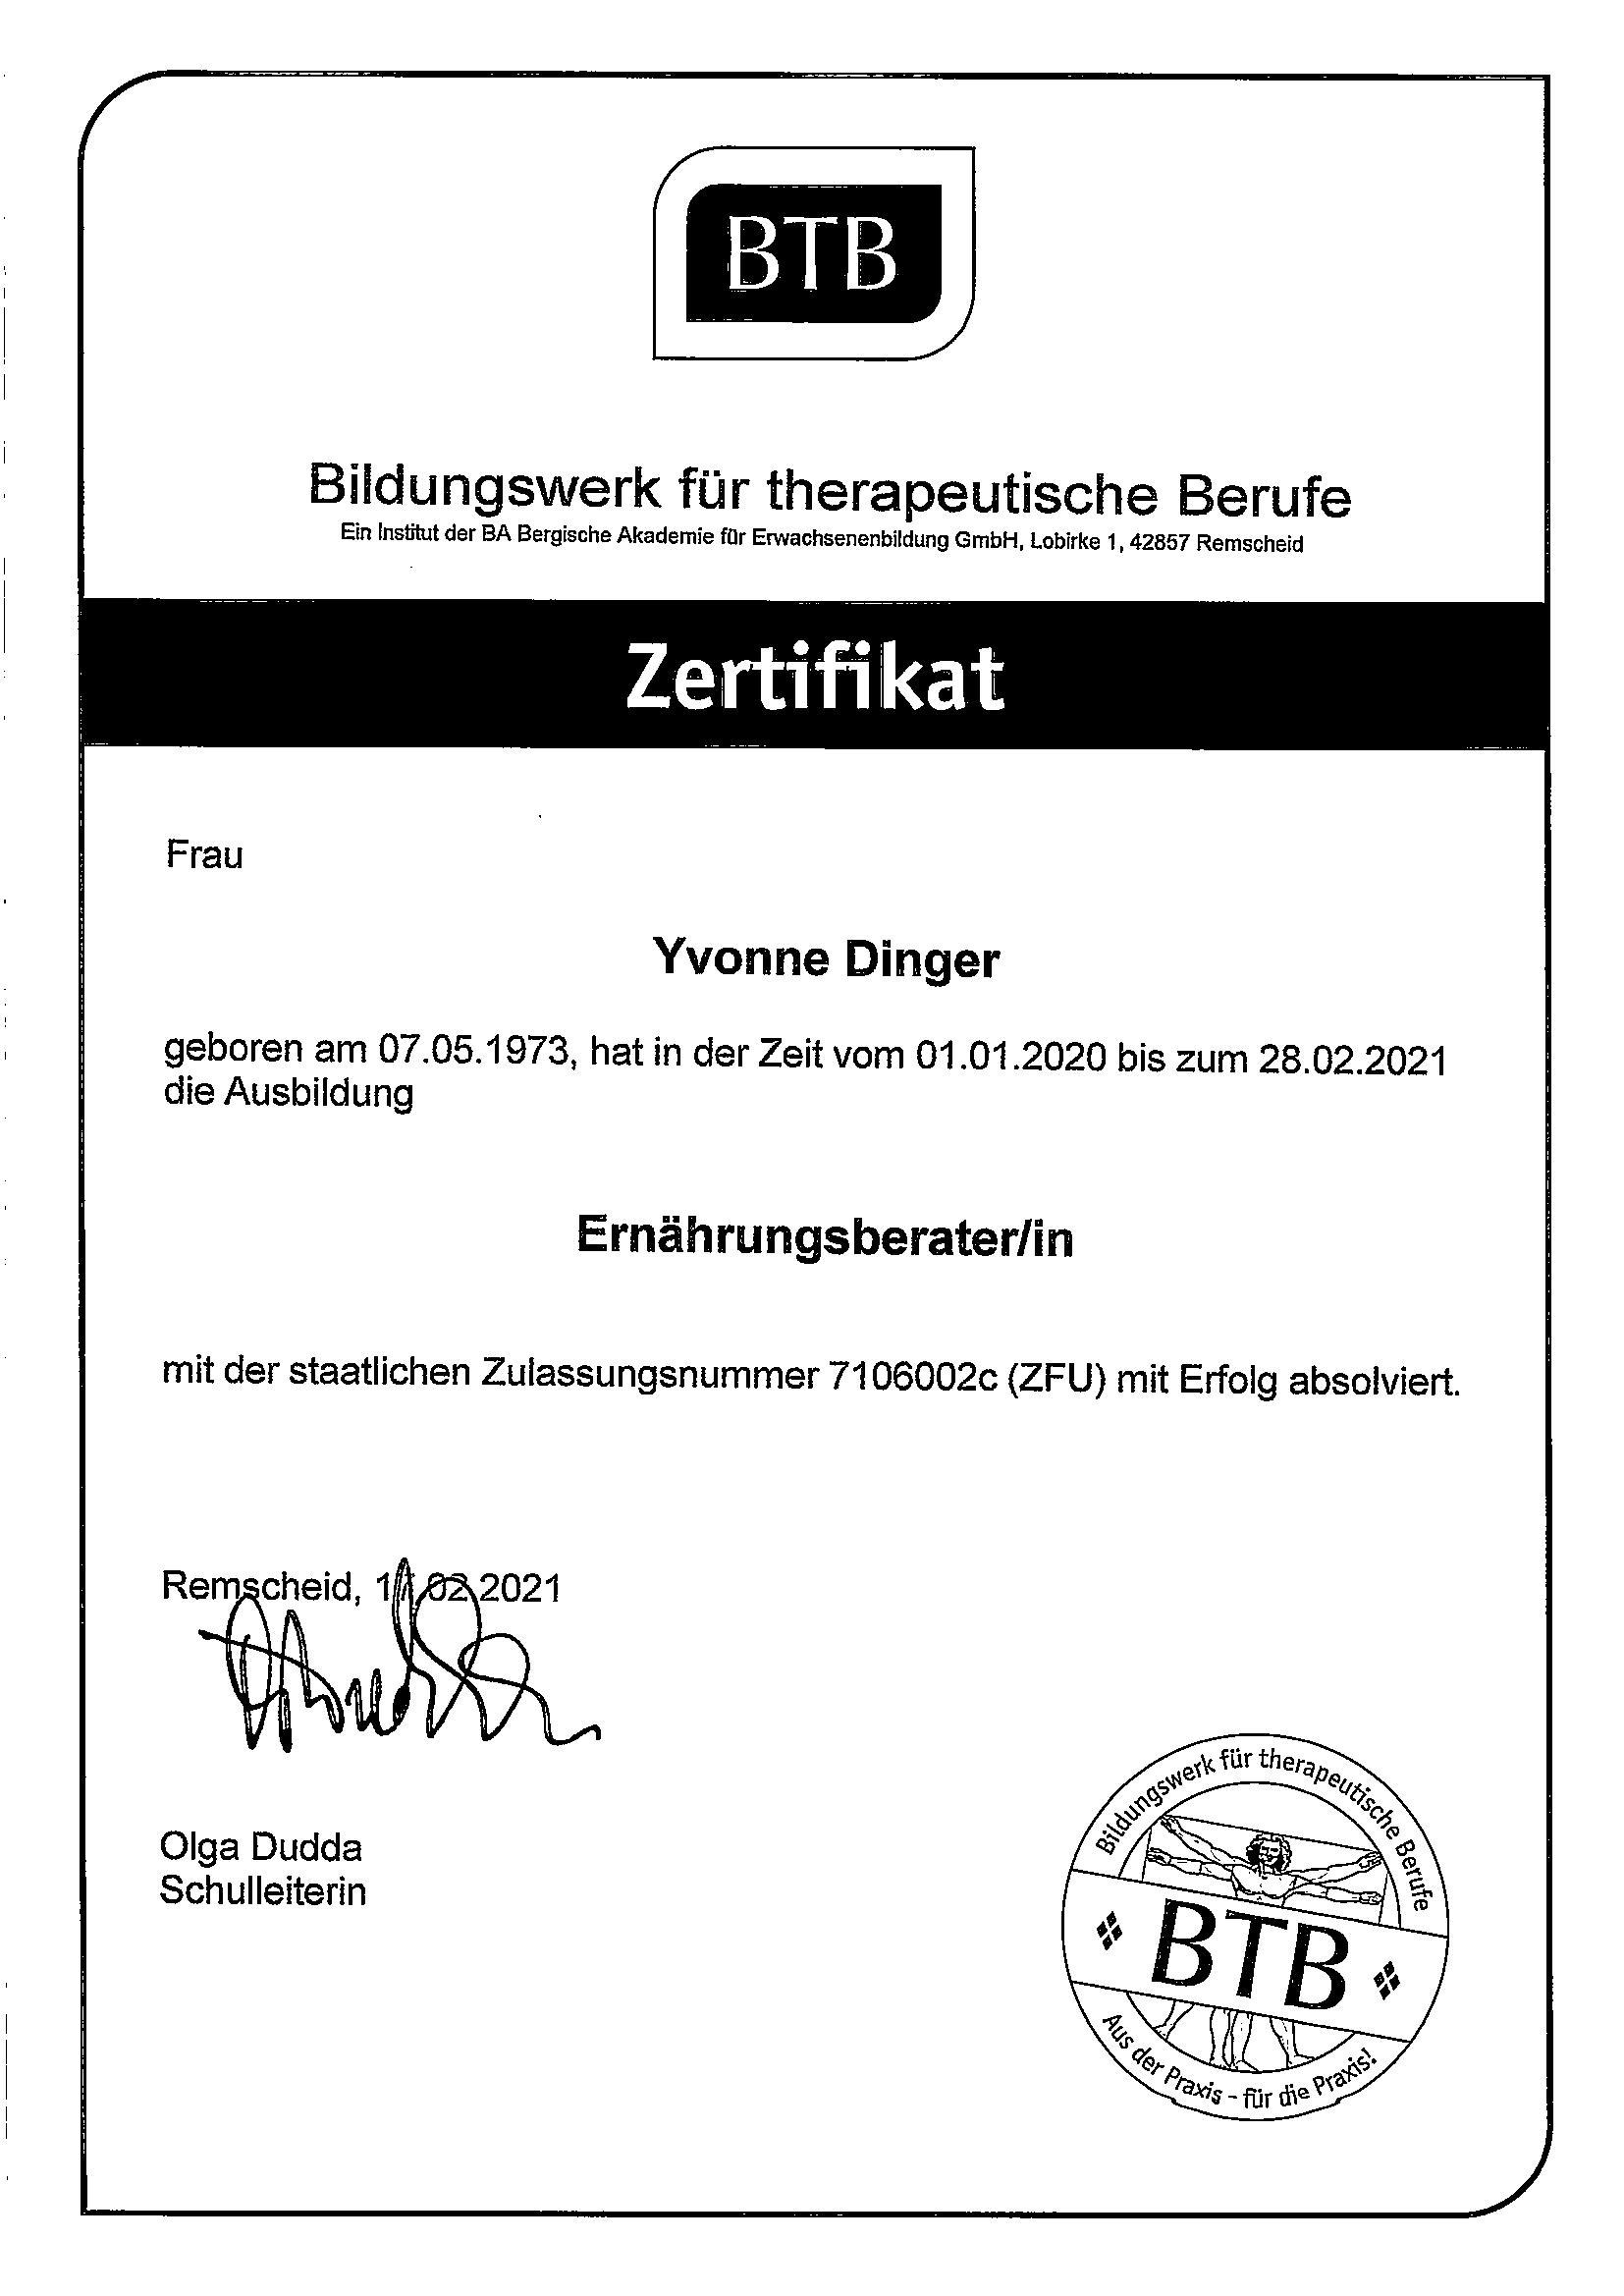 Zertifikat Ernährungsberaterin Yvonne Dinger